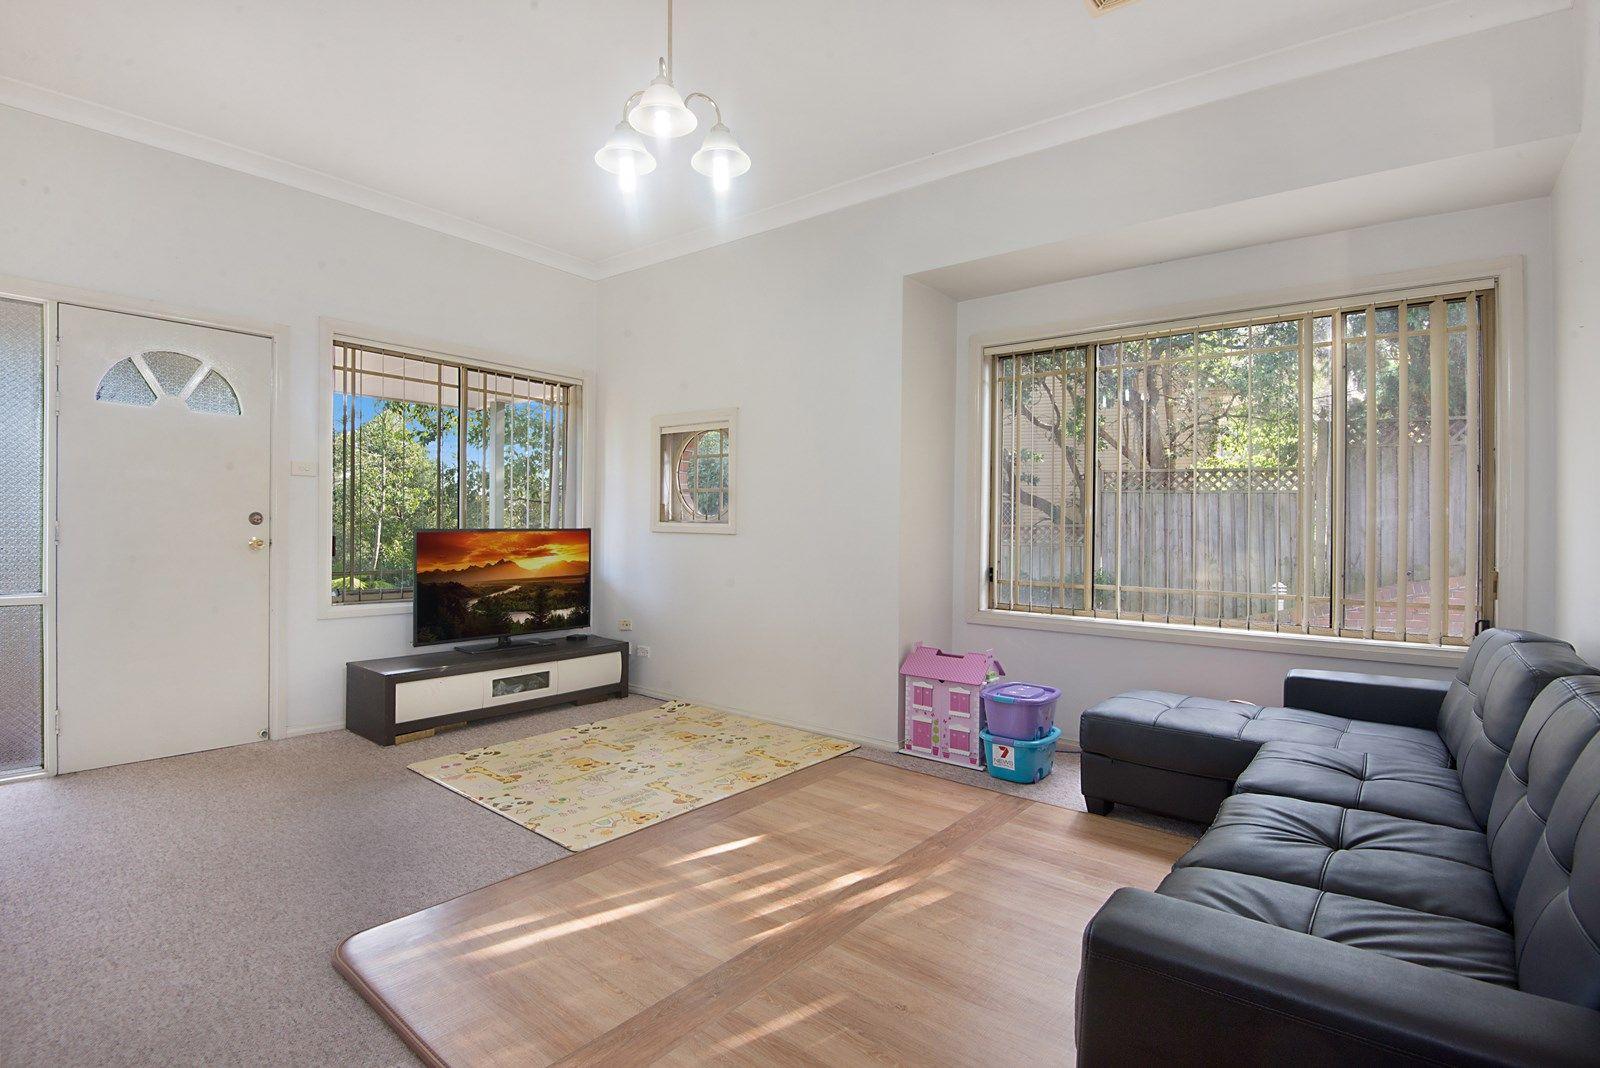 13/193 North Rocks Road, North Rocks NSW 2151, Image 1